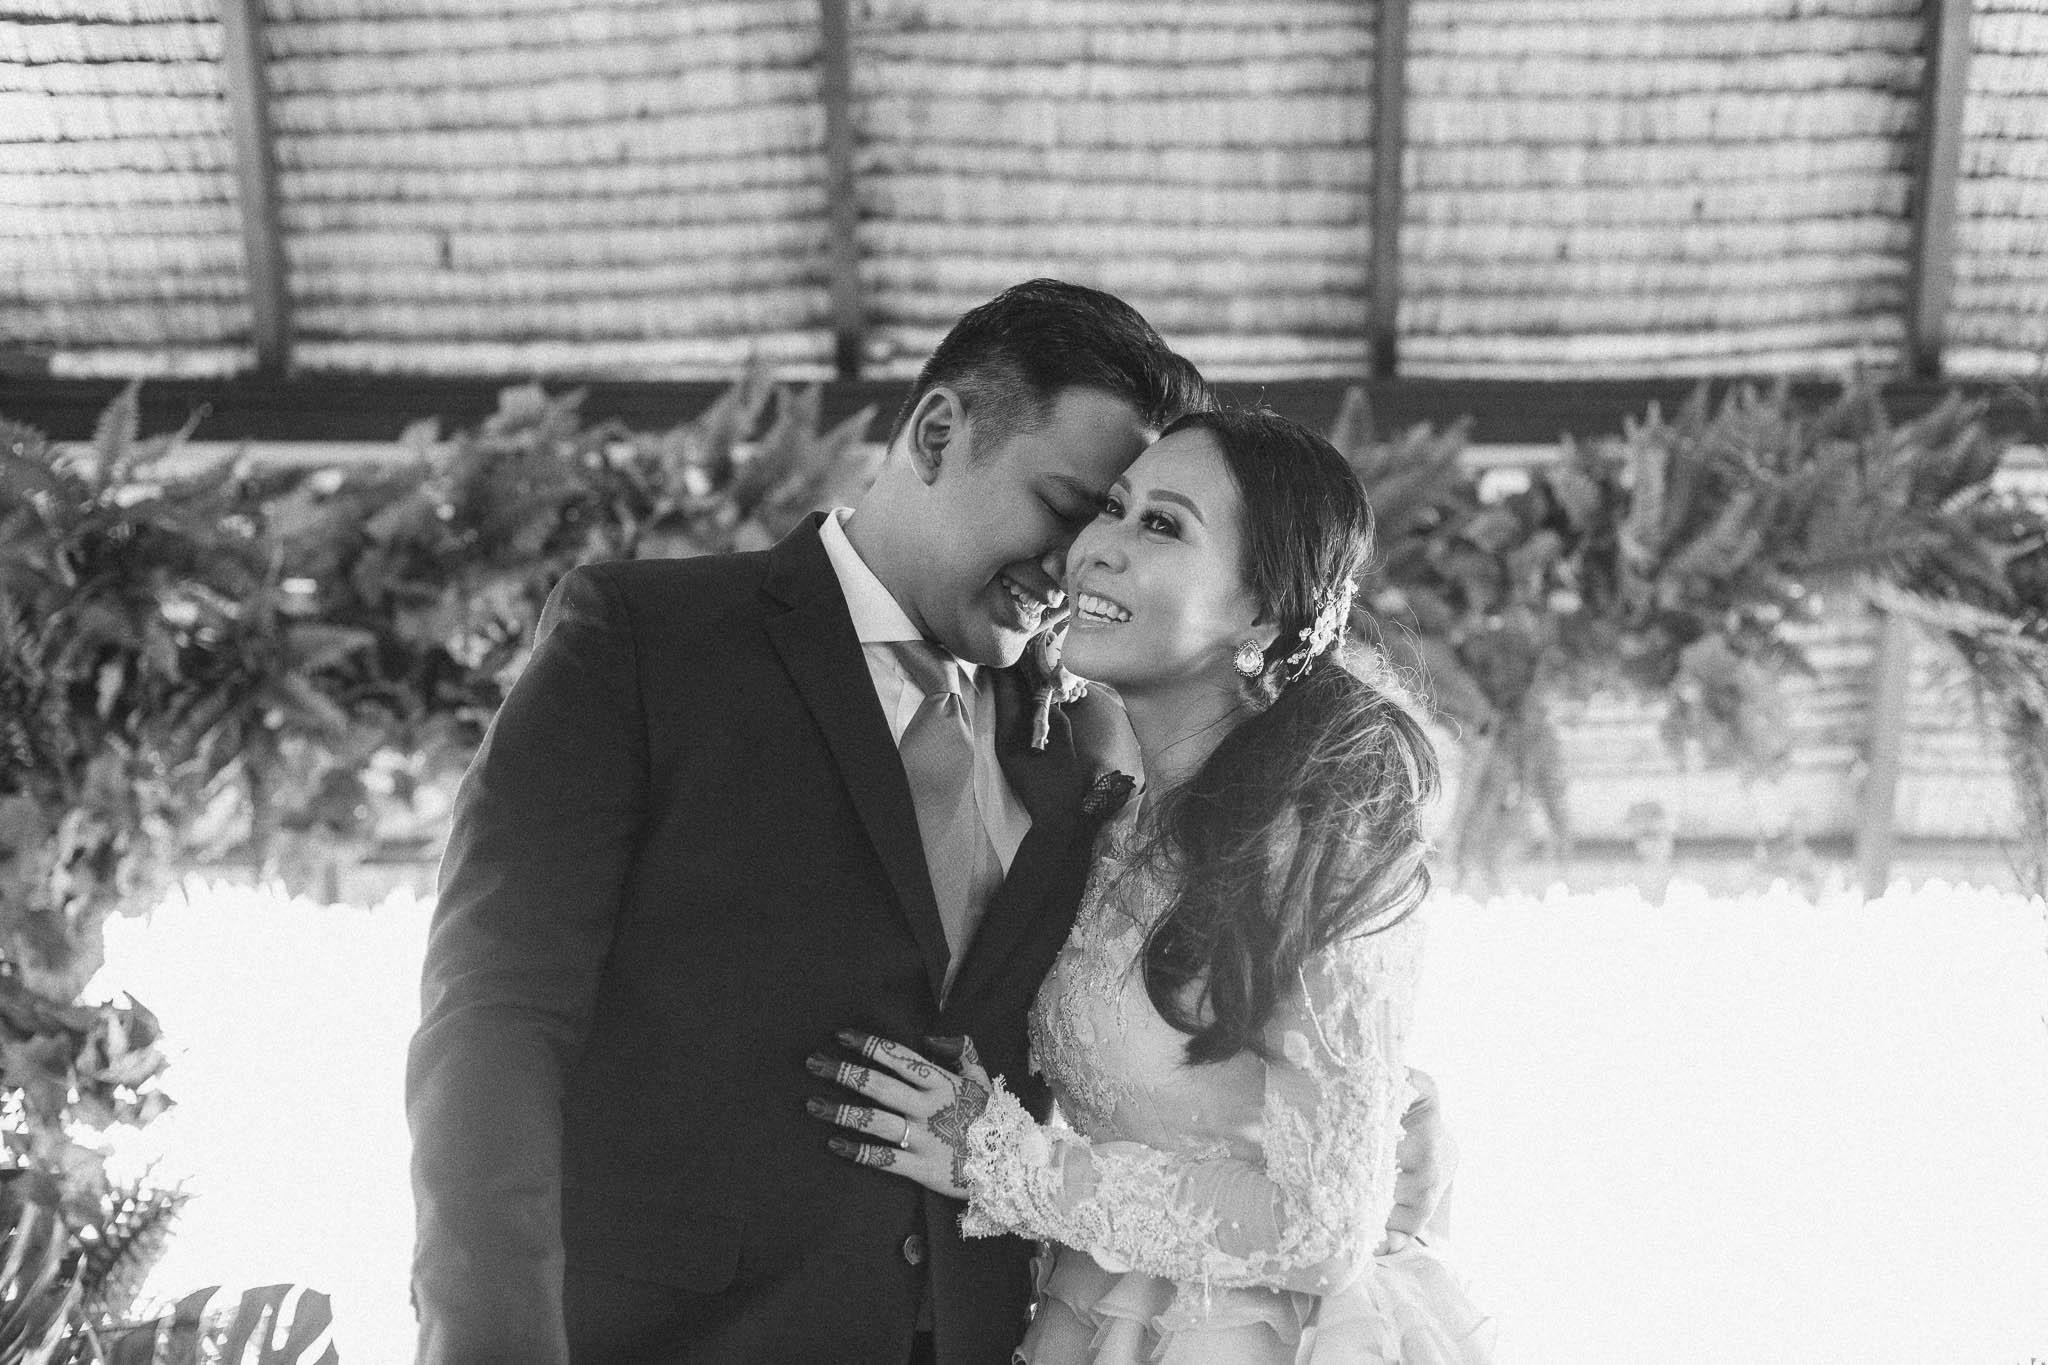 singapore-wedding-photographer-malay-indian-pre-wedding-travel-wmt-2015-73.jpg